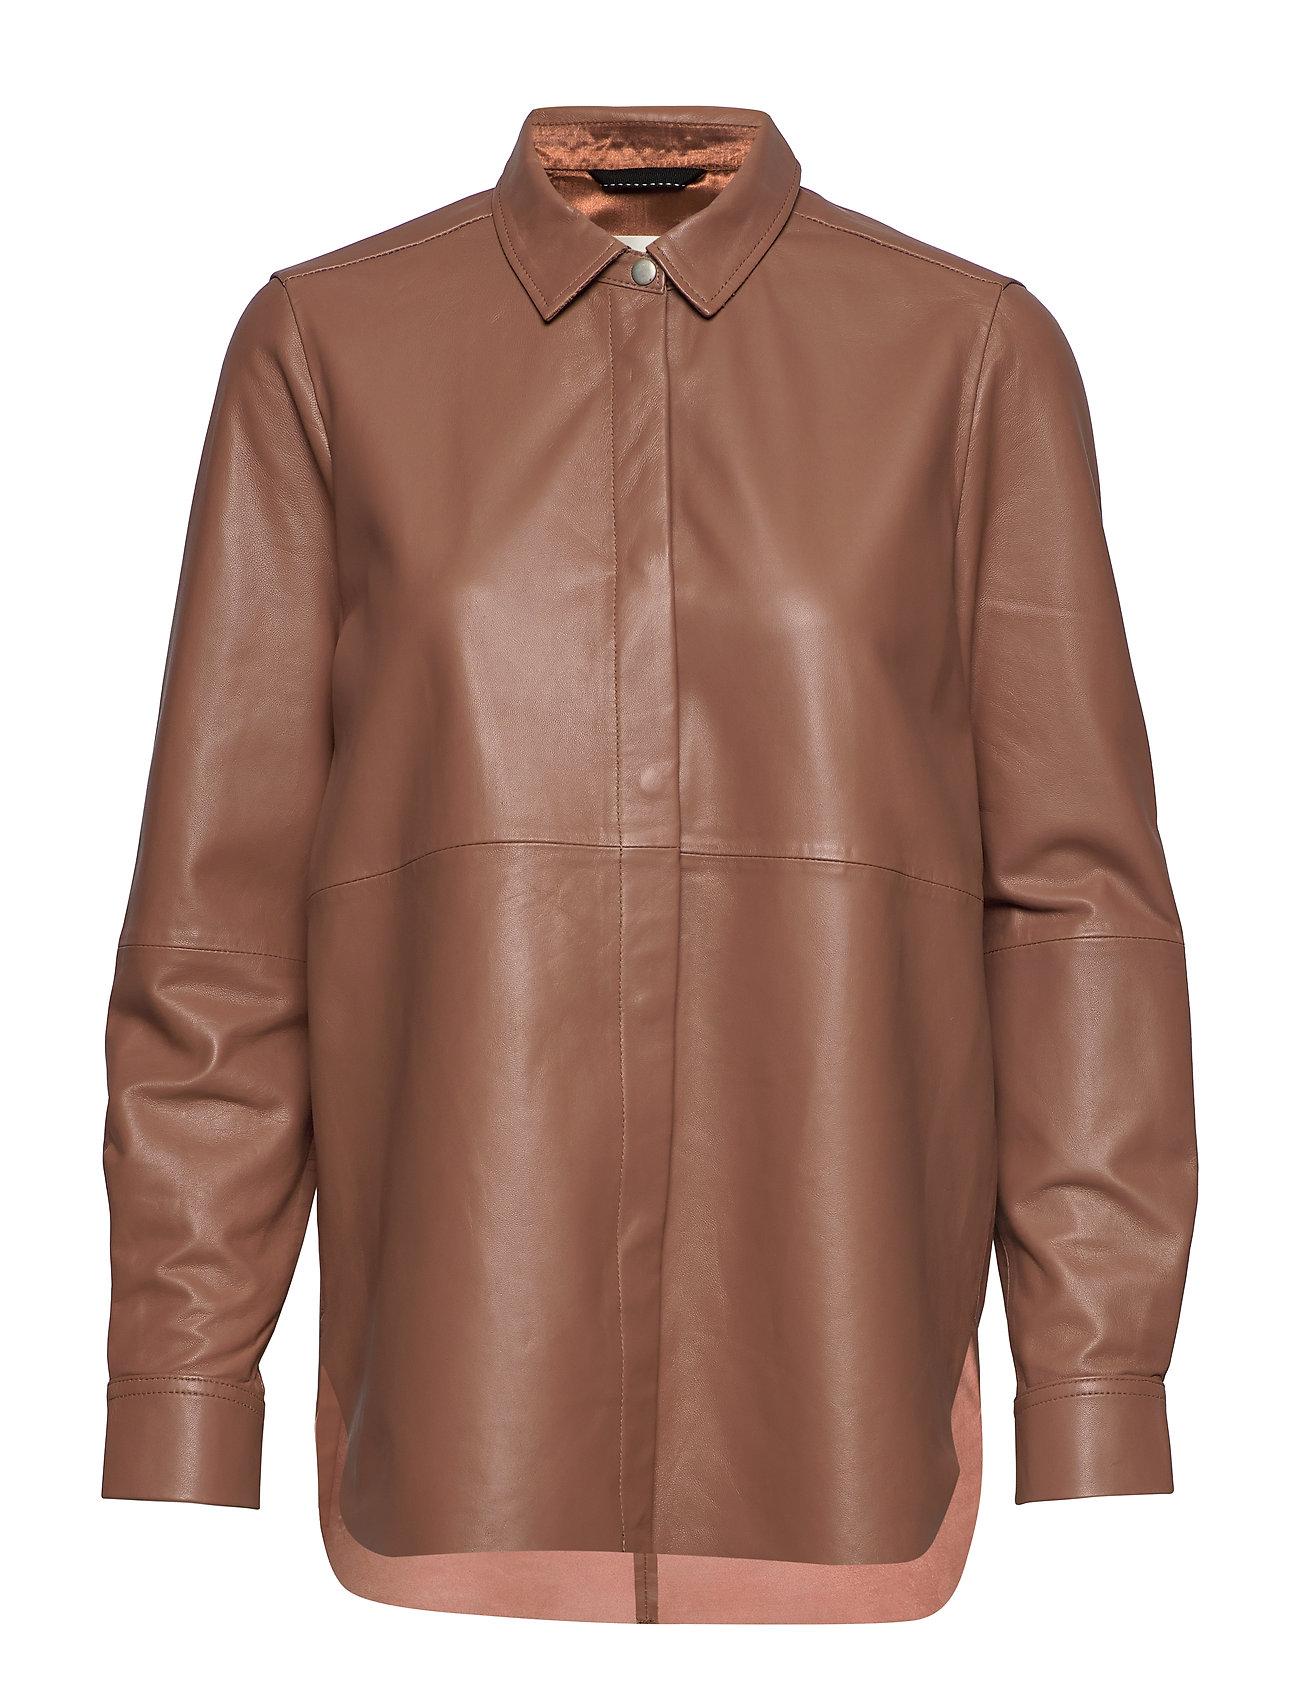 InWear KhandiIW Shirt - CINNAMON